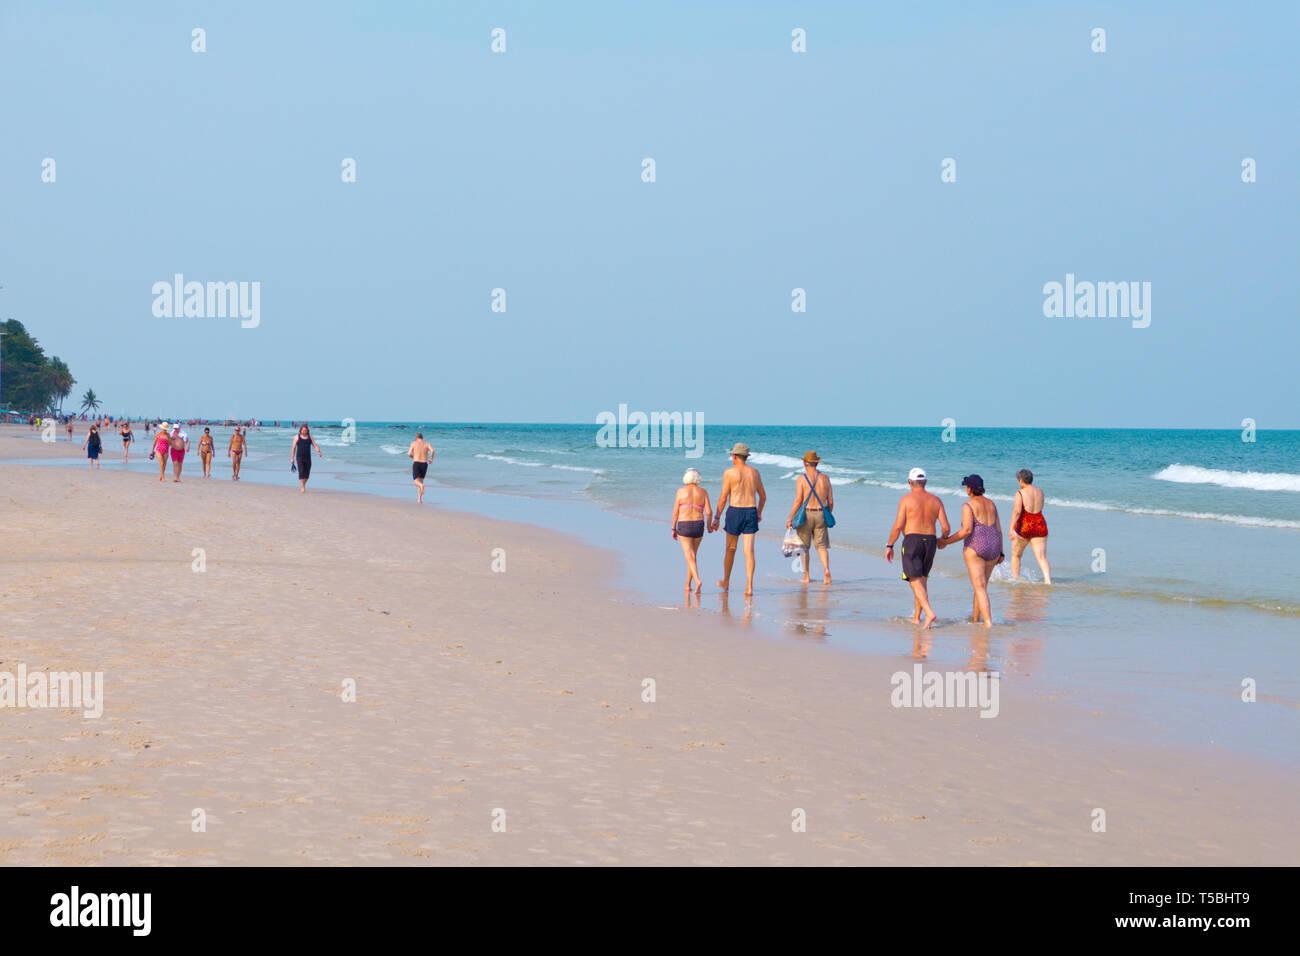 People, walking, beach, Hua Hin, Thailand Stock Photo